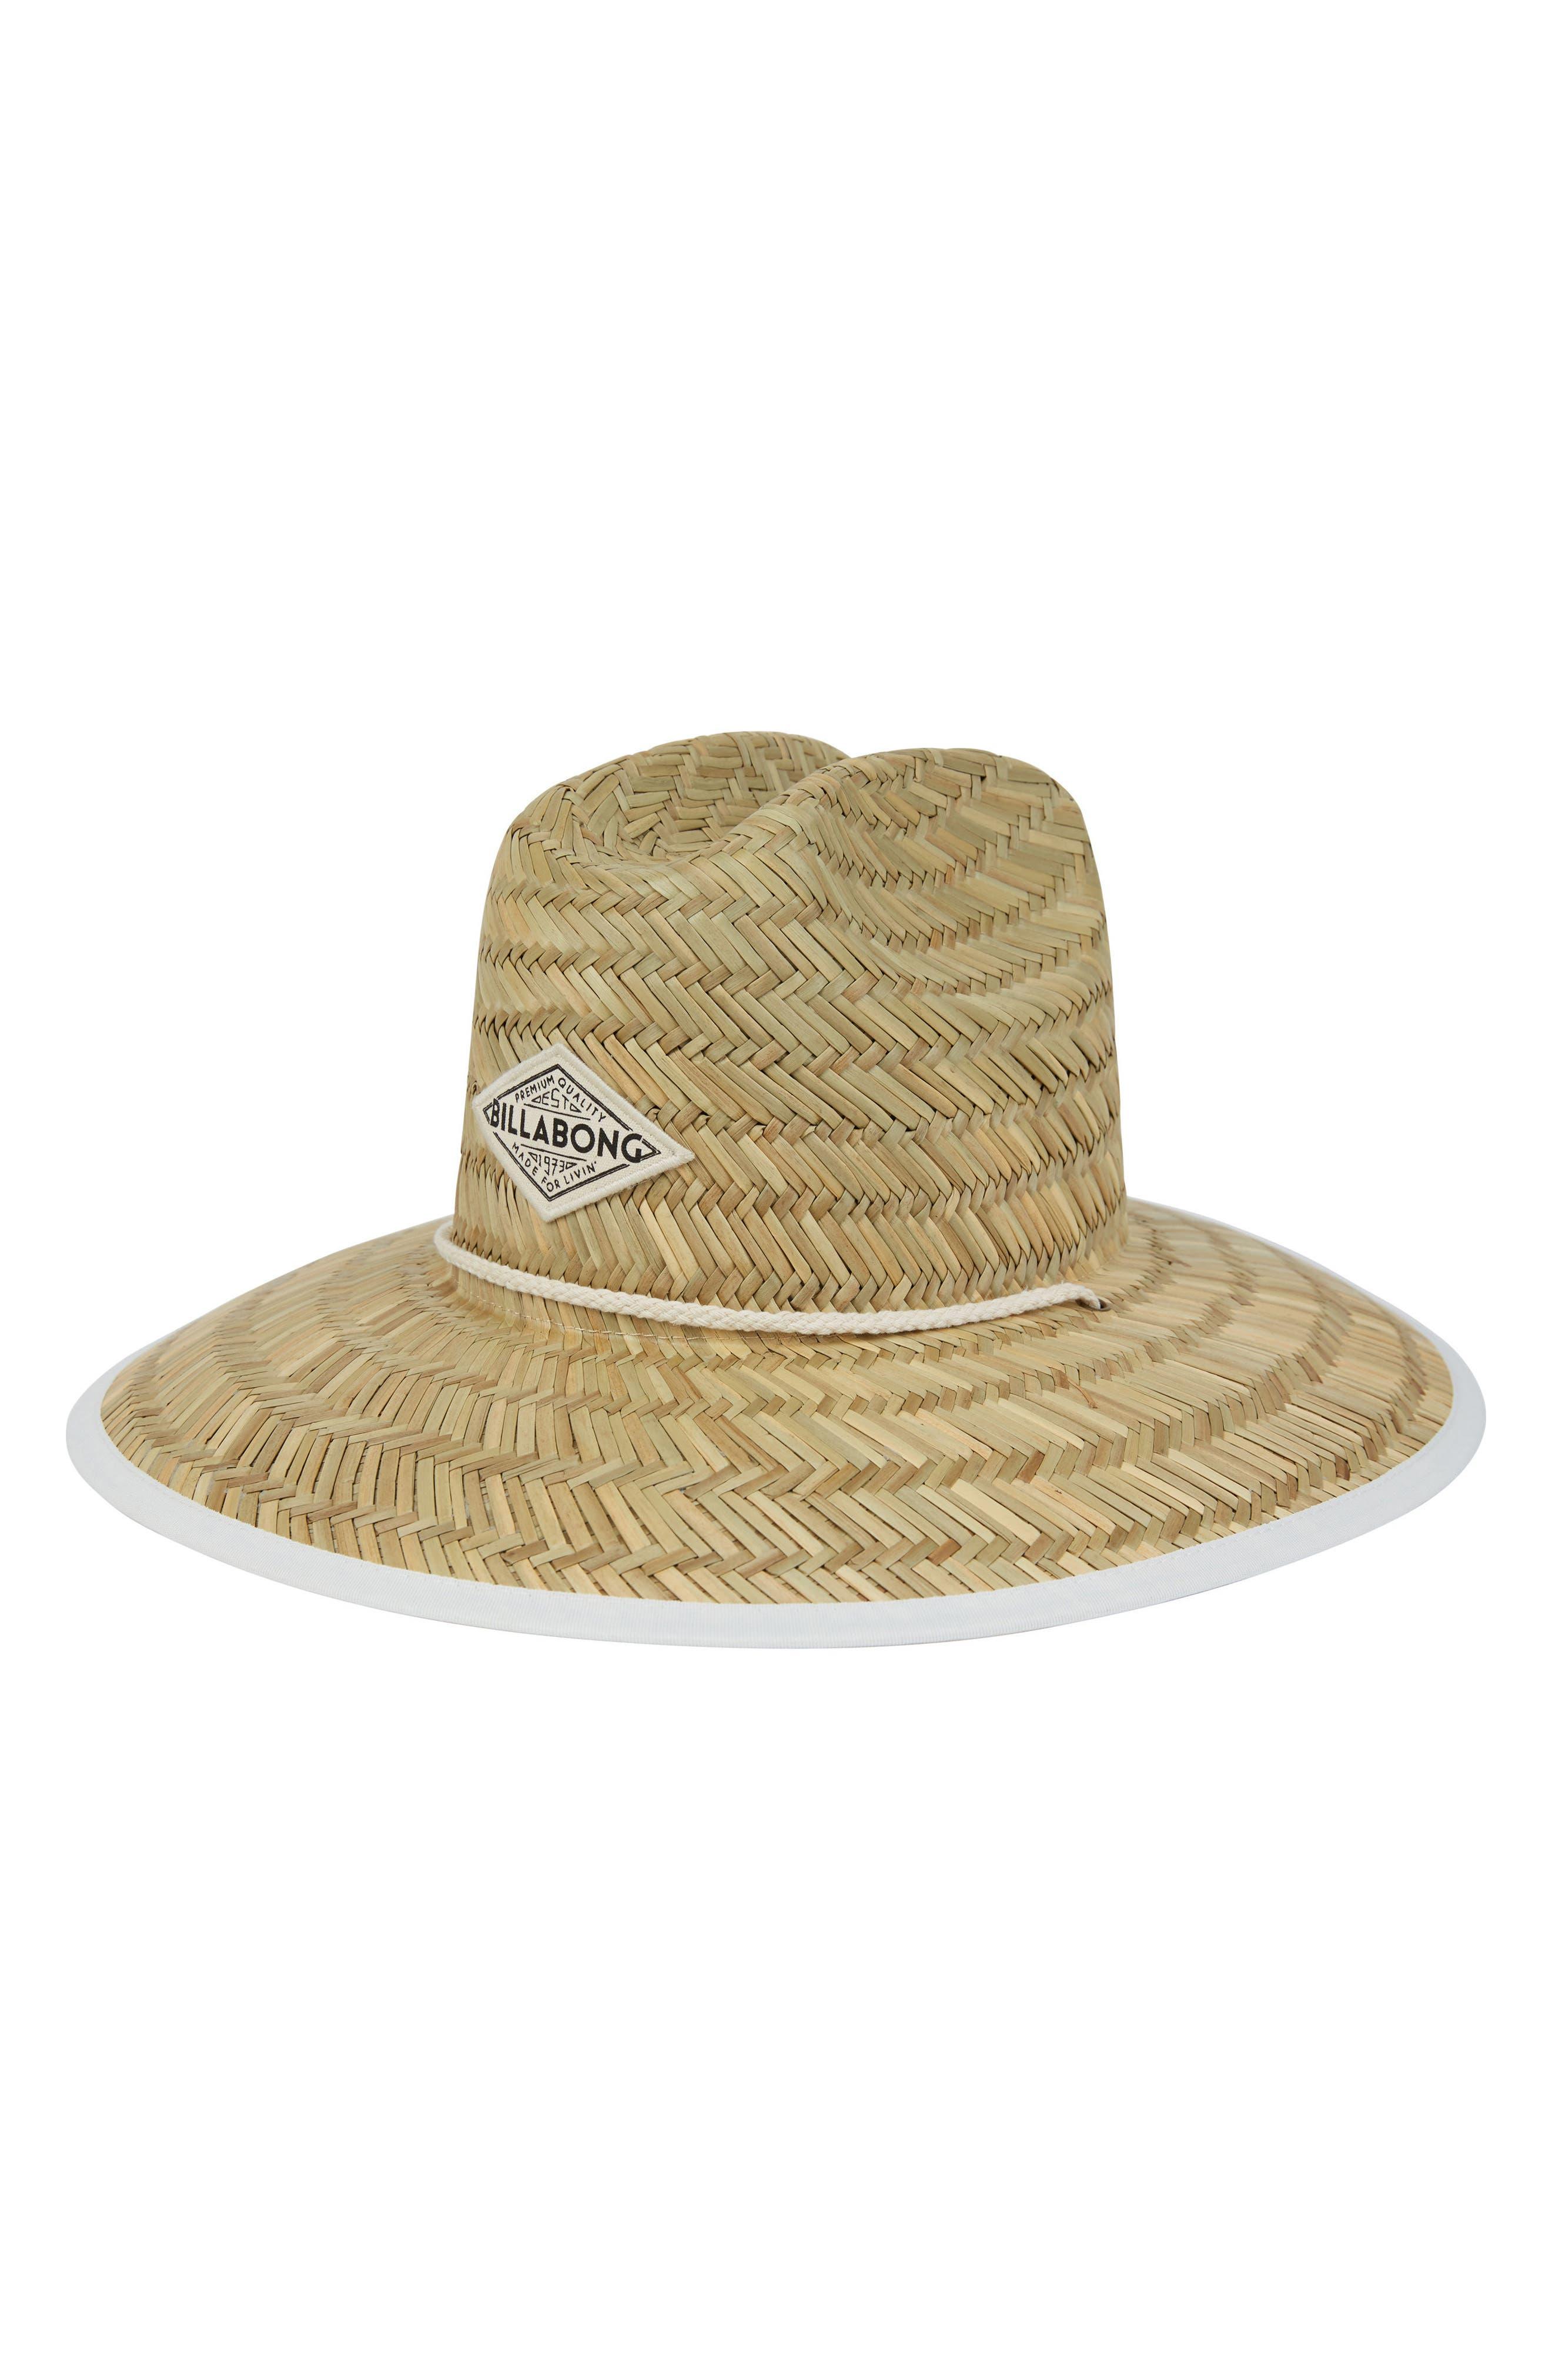 Tipton Straw Hat,                             Main thumbnail 1, color,                             250